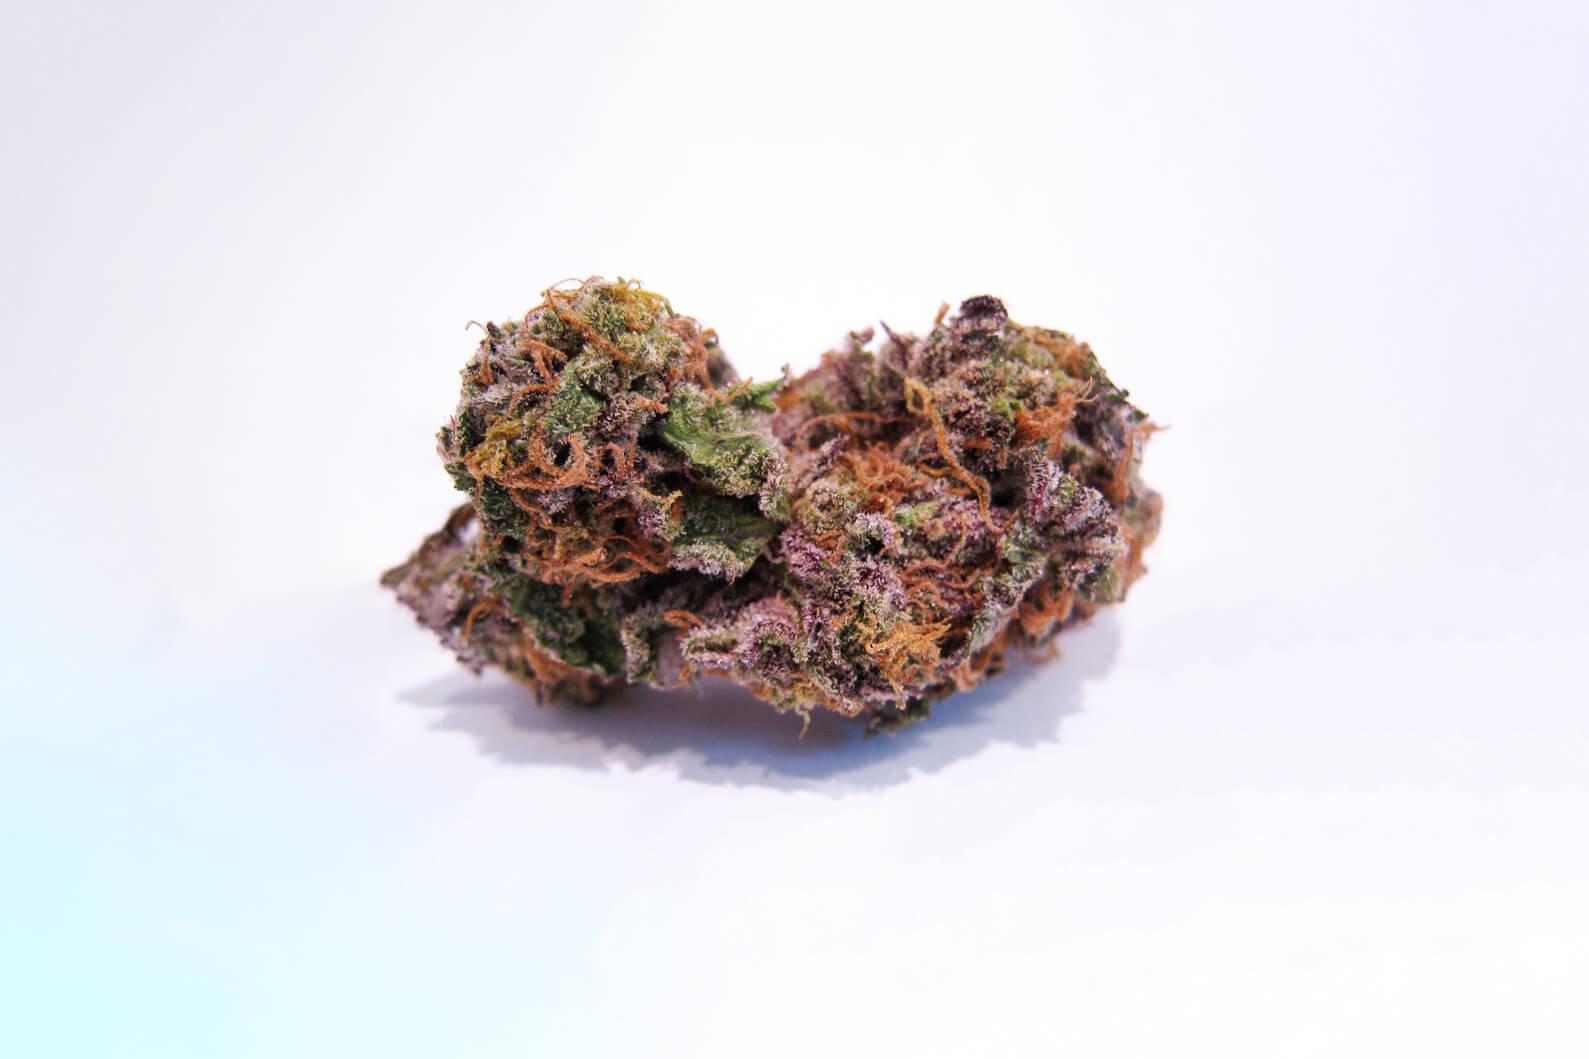 Granddaddy Purple (GDP, Granddaddy Purp) strain photo 2